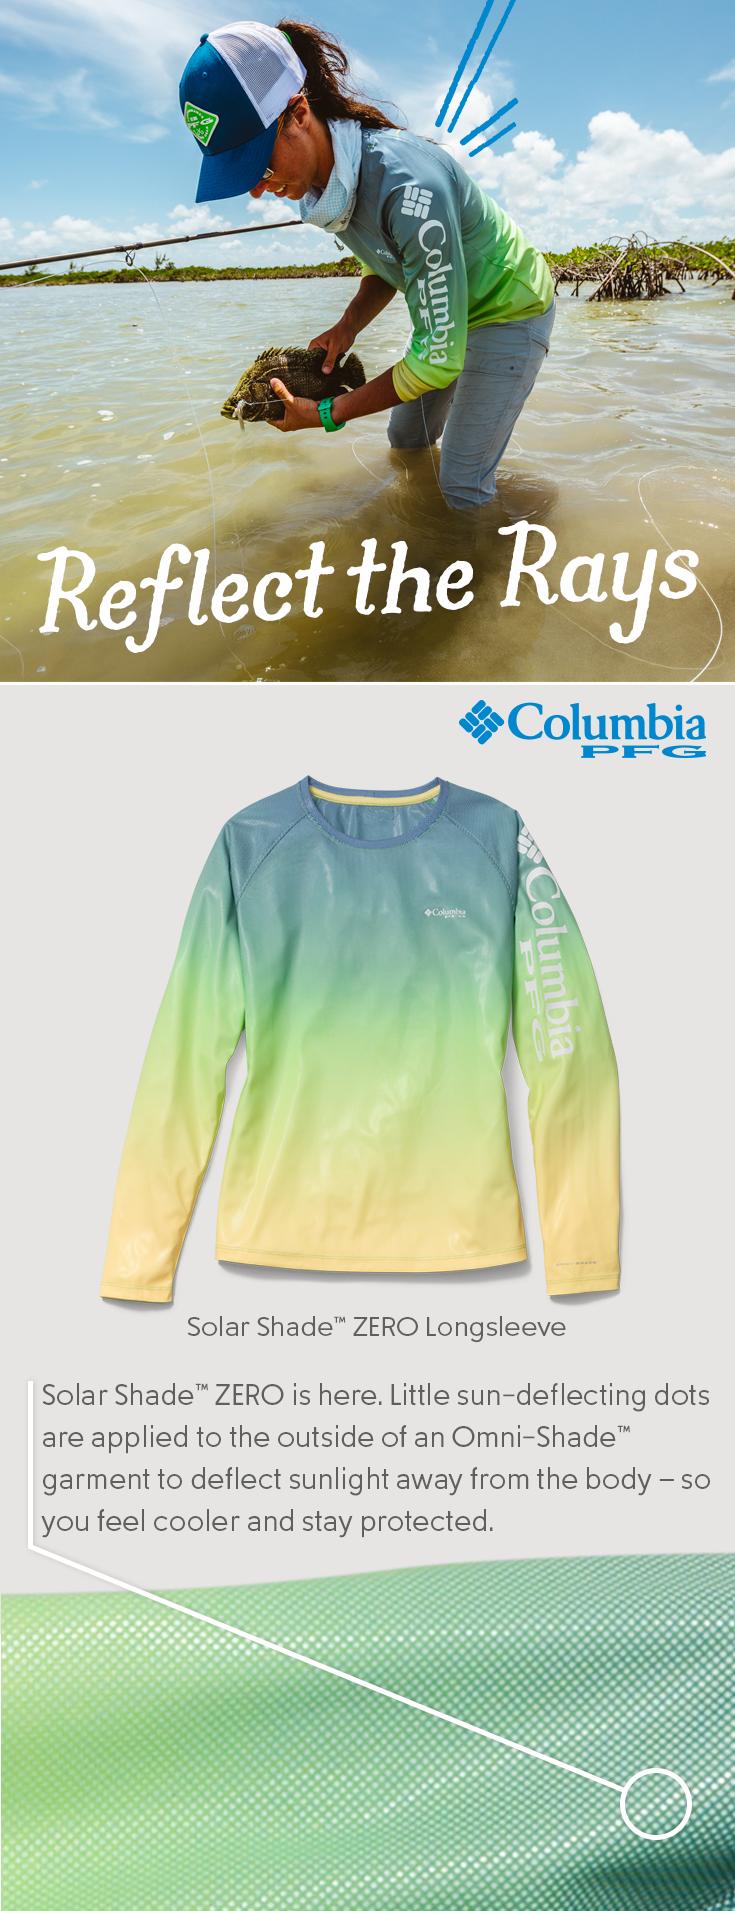 3149c8b346 Women's PFG Solar Shade™ Long Sleeve Shirt   cool clothing for the ...